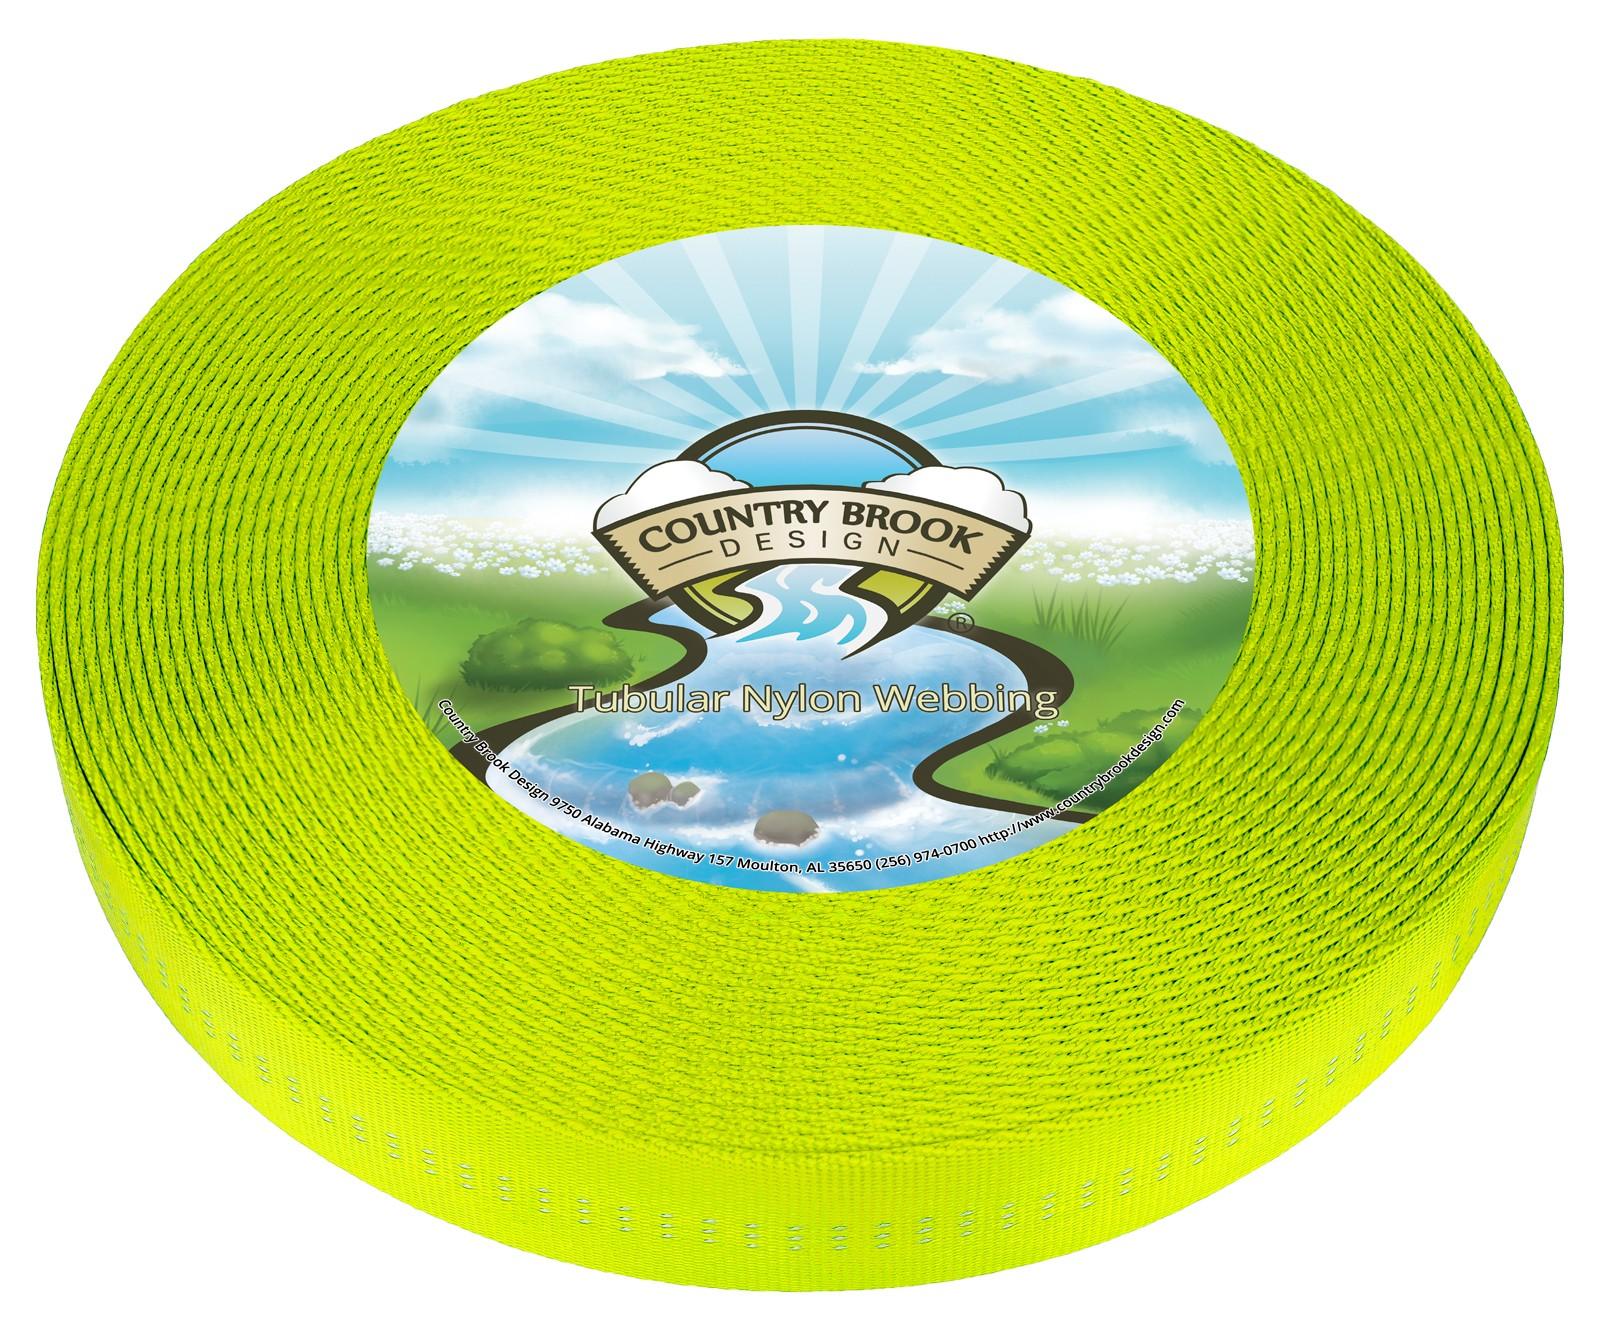 5 Yards Country Brook Design® 1 Inch Black Climbing Spec Tubular Nylon Webbing